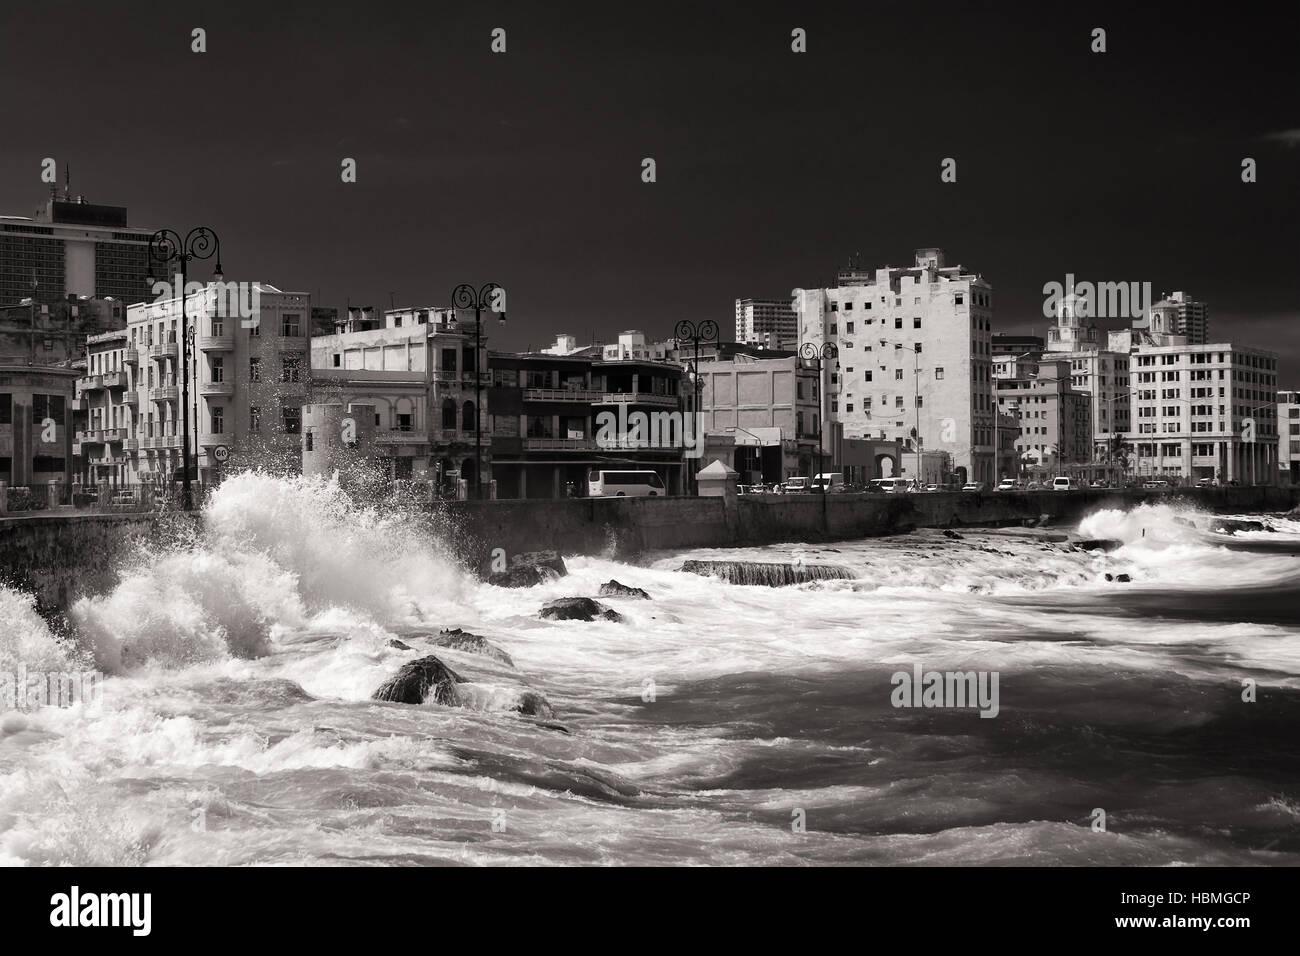 the Malecon in Havana, Cuba Stock Photo